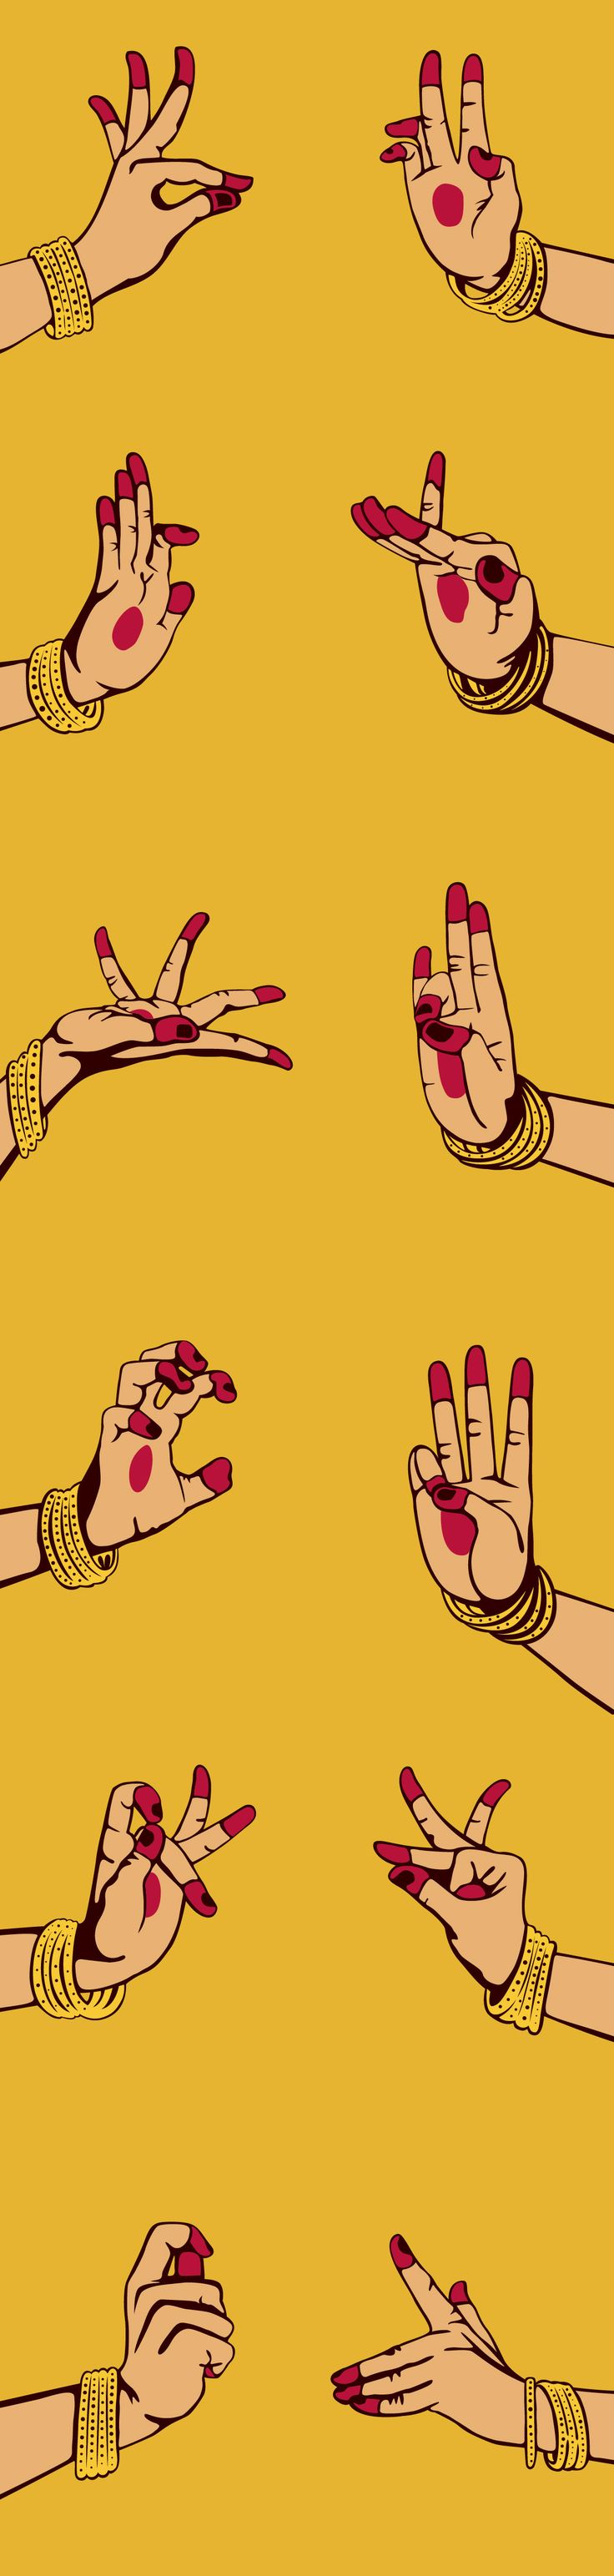 Hand Gesture clipart rare Illustration Best are mudras 20+